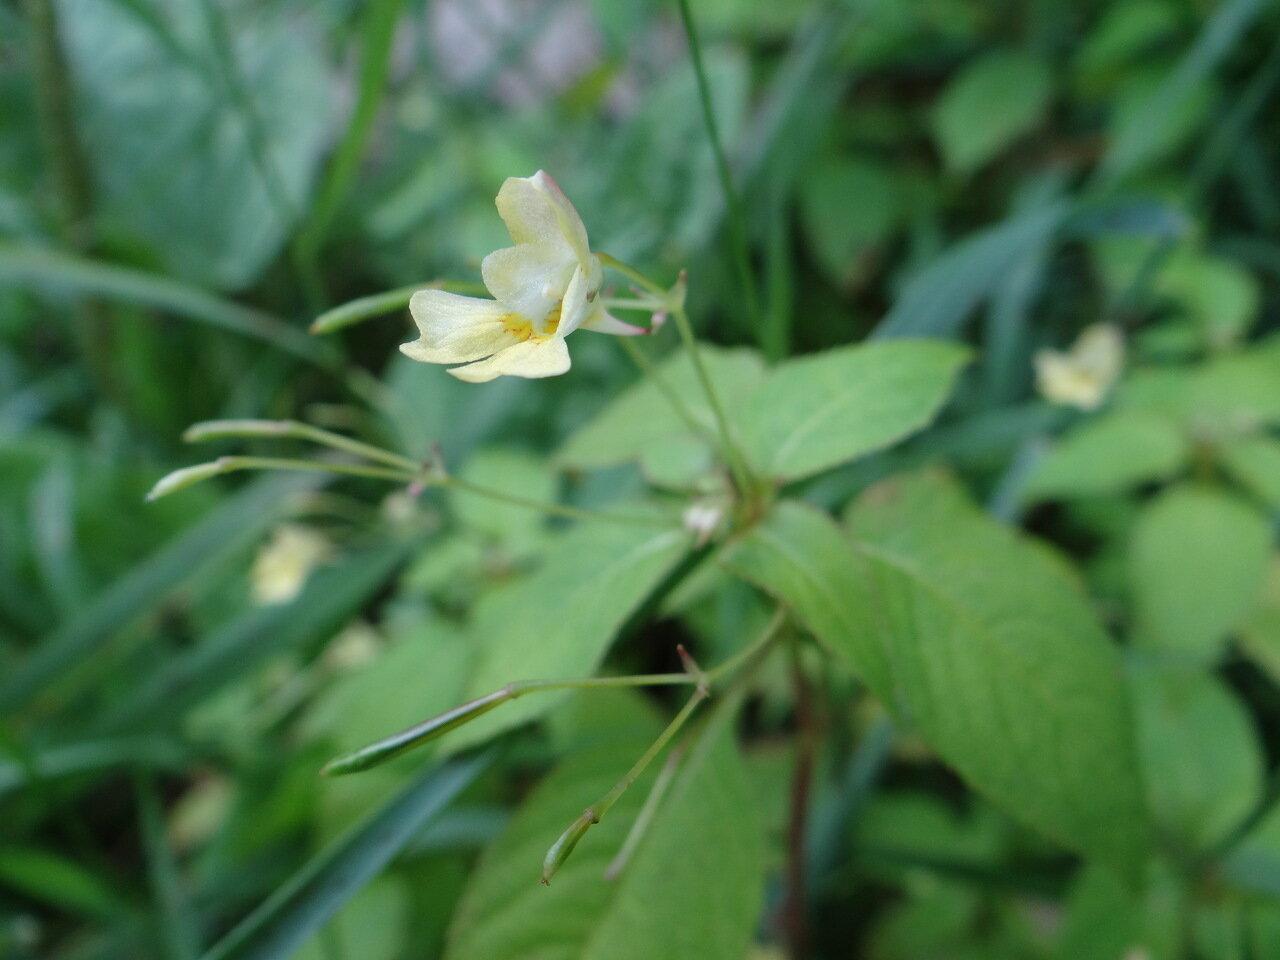 Недотрога мелкоцветковая (Impatiens parviflora). Автор фото:Привалова Марина